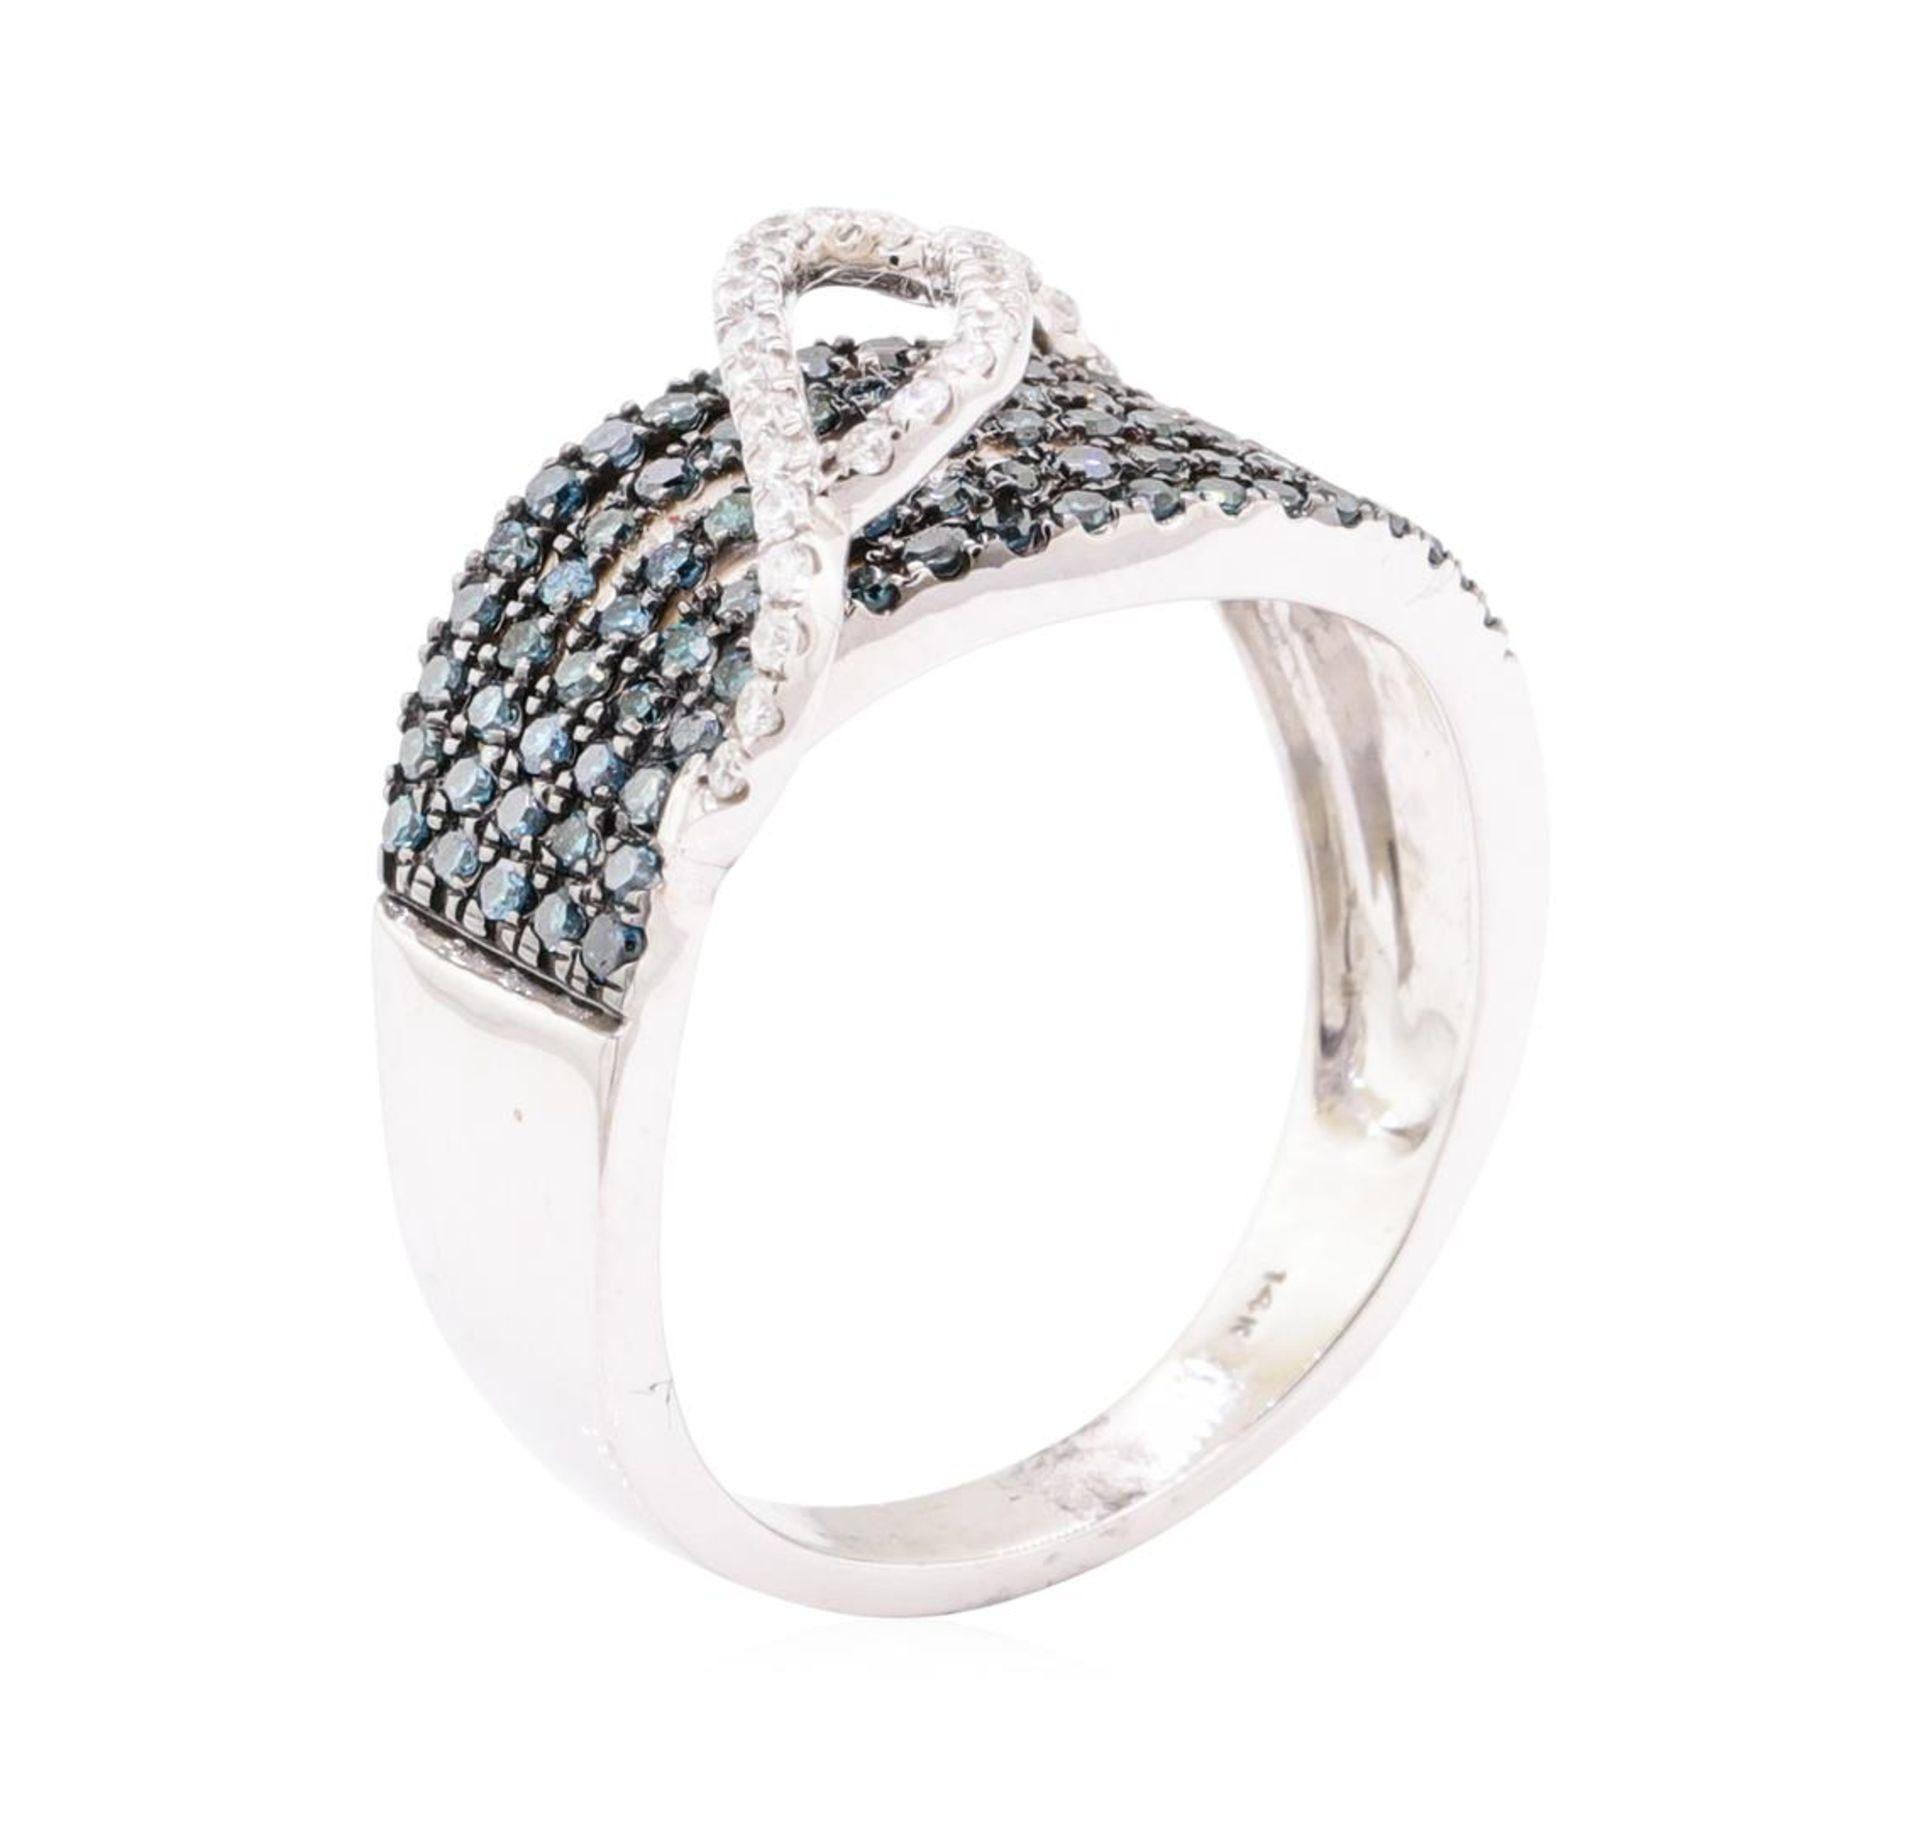 0.73 ctw Diamond Ring - 14KT White Gold - Image 4 of 5